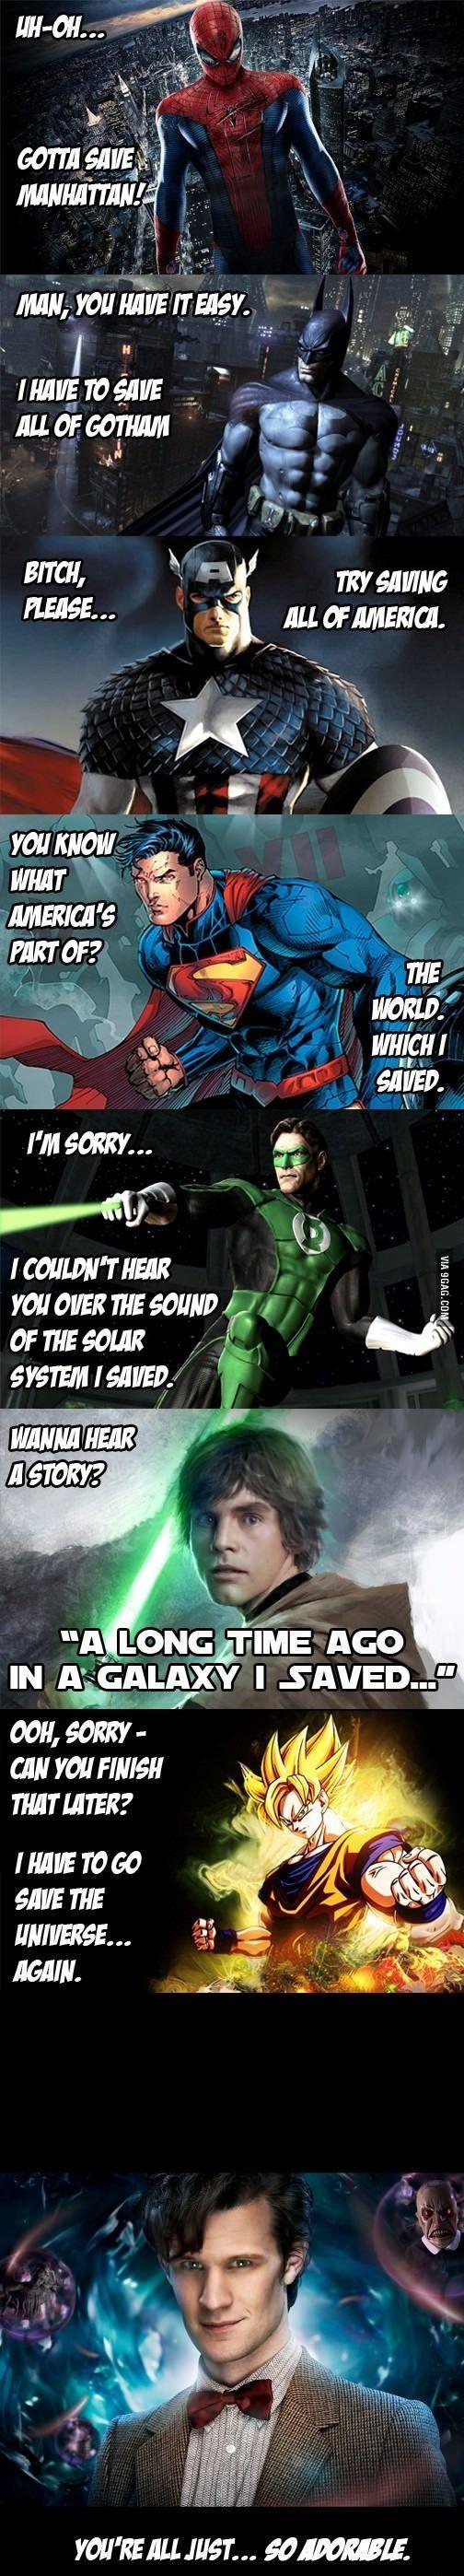 Who Watches The Watchers? Doctor Who Captain America Luke Skywalker Batman Superman Green Lantern Dragonball Z